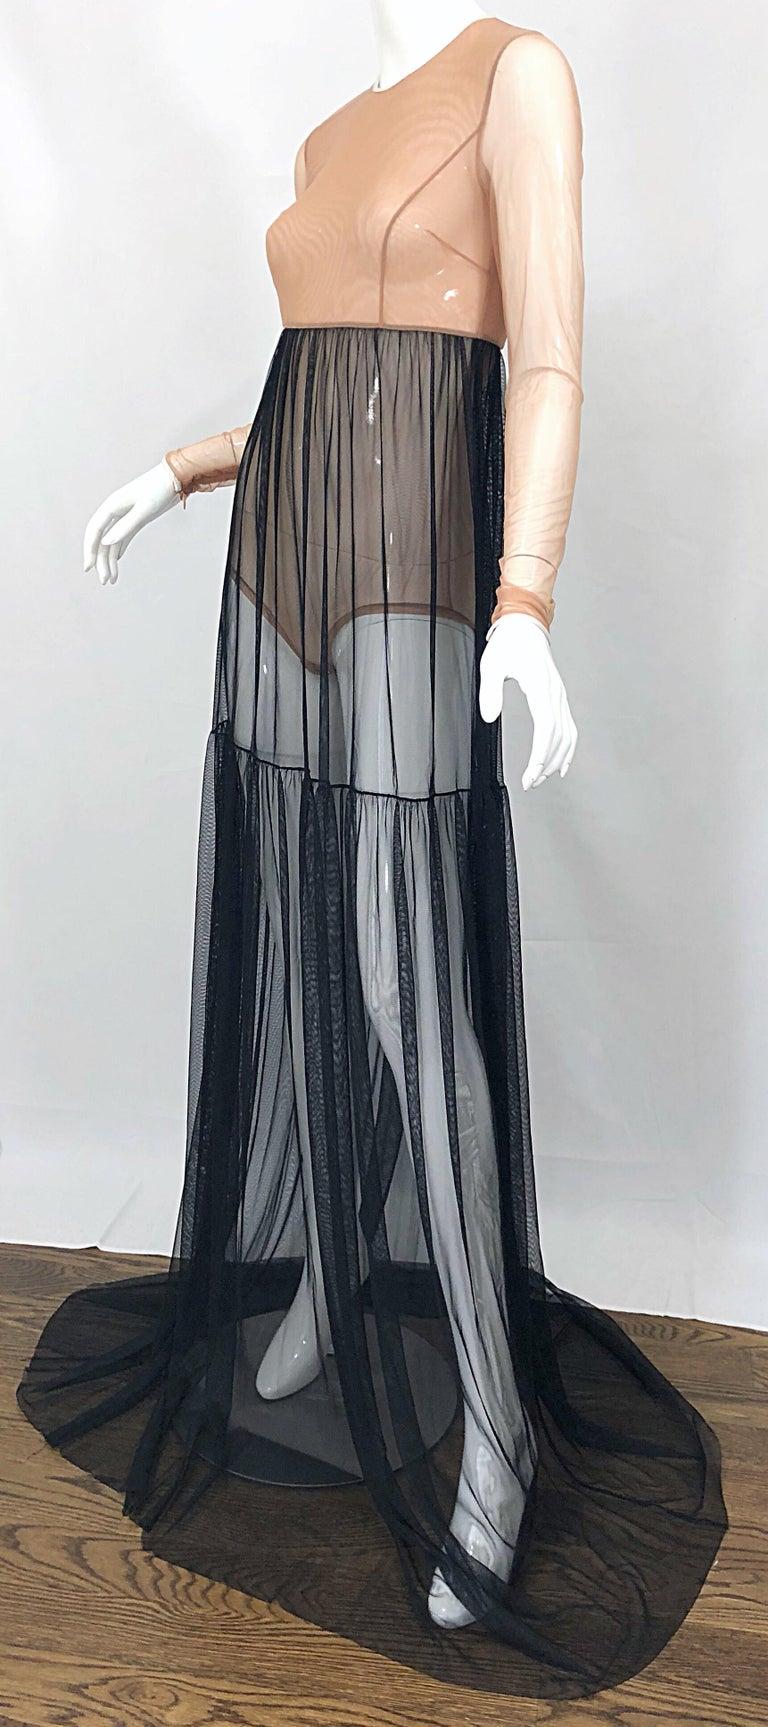 Michael Kors Collection Sz 4 Nude + Black Sheer Runway Mesh Bodysuit Gown Dress For Sale 4